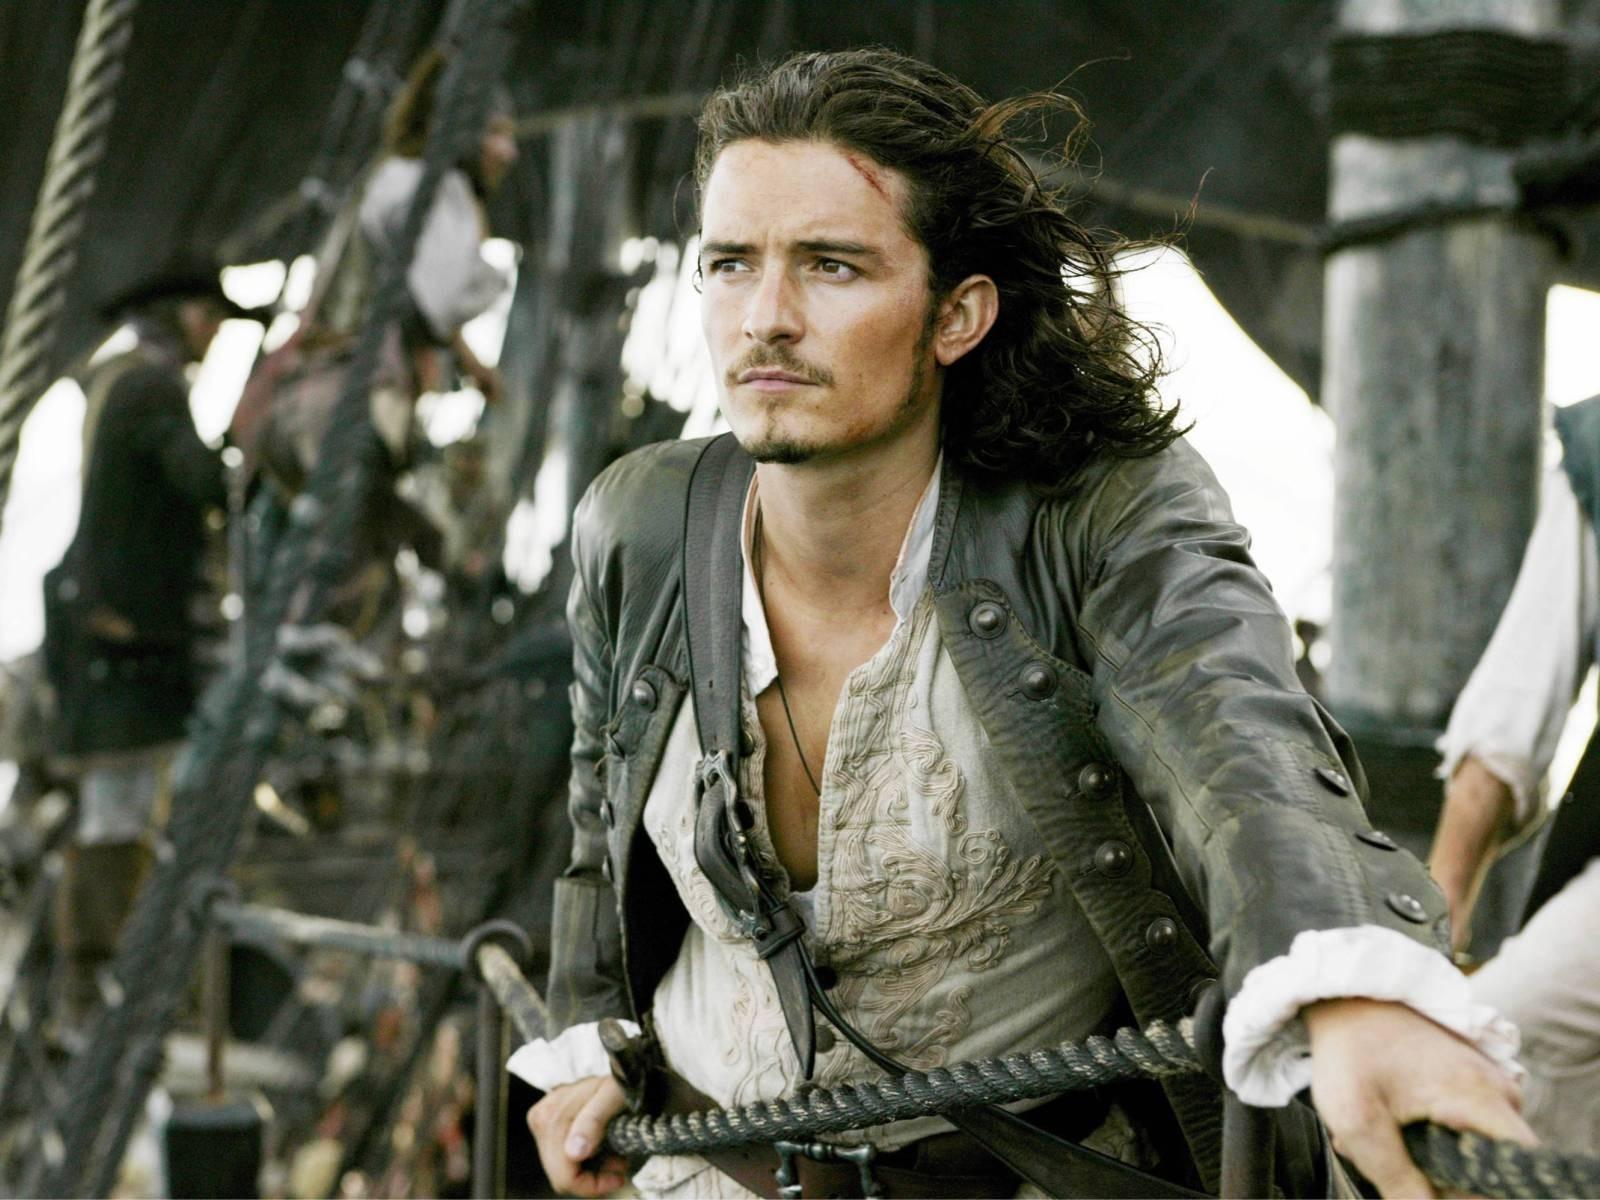 http://1.bp.blogspot.com/--Pgm52AZiTg/UA8lo2VlJpI/AAAAAAAAAxE/nkxxEGvHUH4/s1600/Pirates+of+the+Caribbean+Dead+Man\'s+Chest.jpg